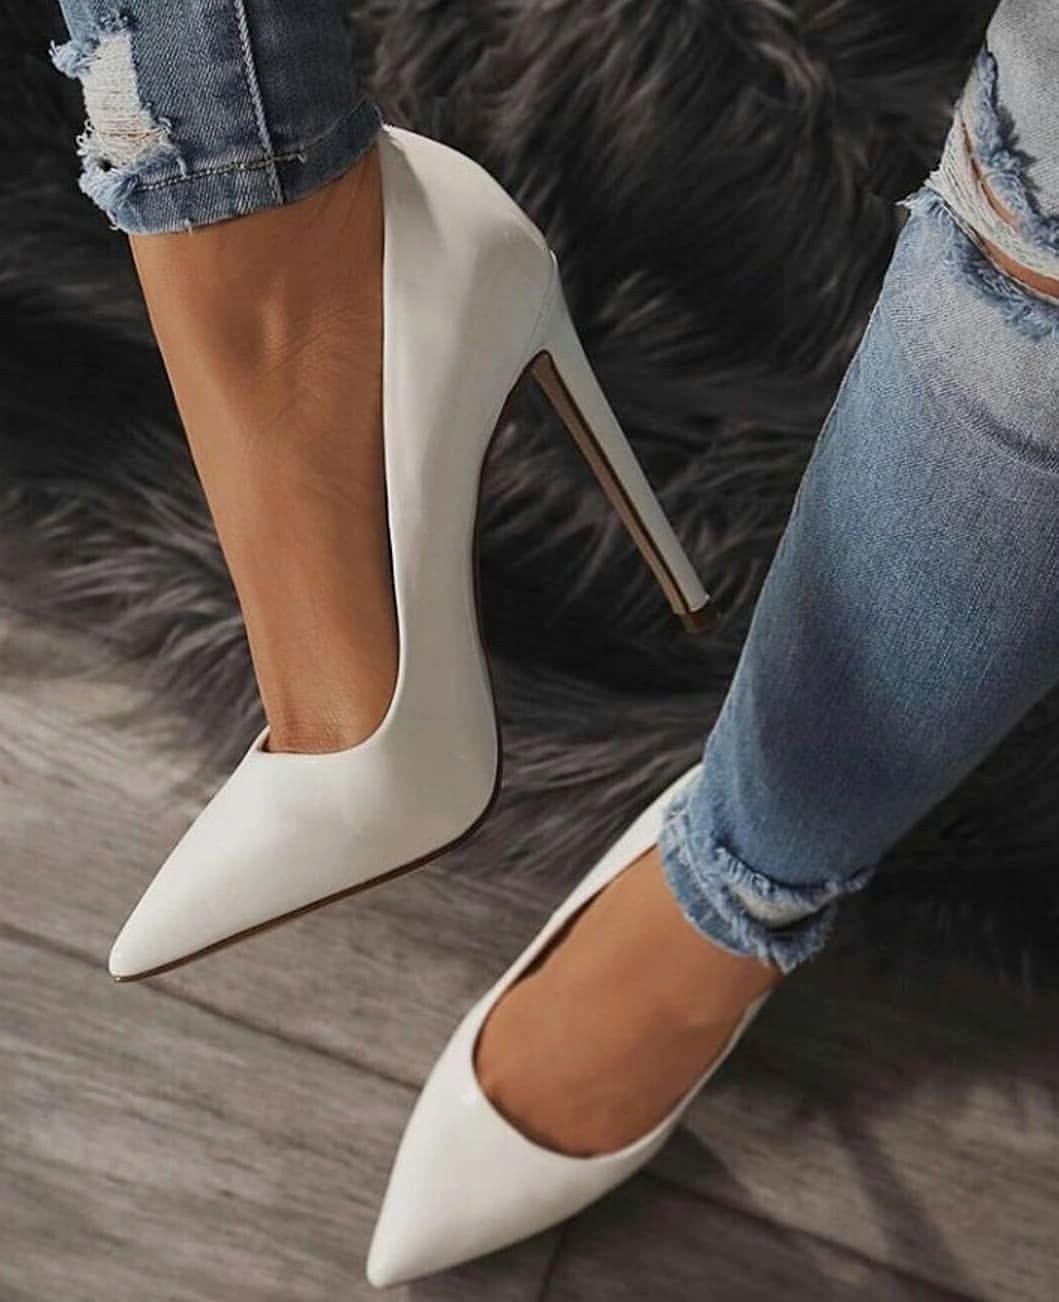 Sandals High Heels Outfit Heels Stiletto Heels Shoe Boots